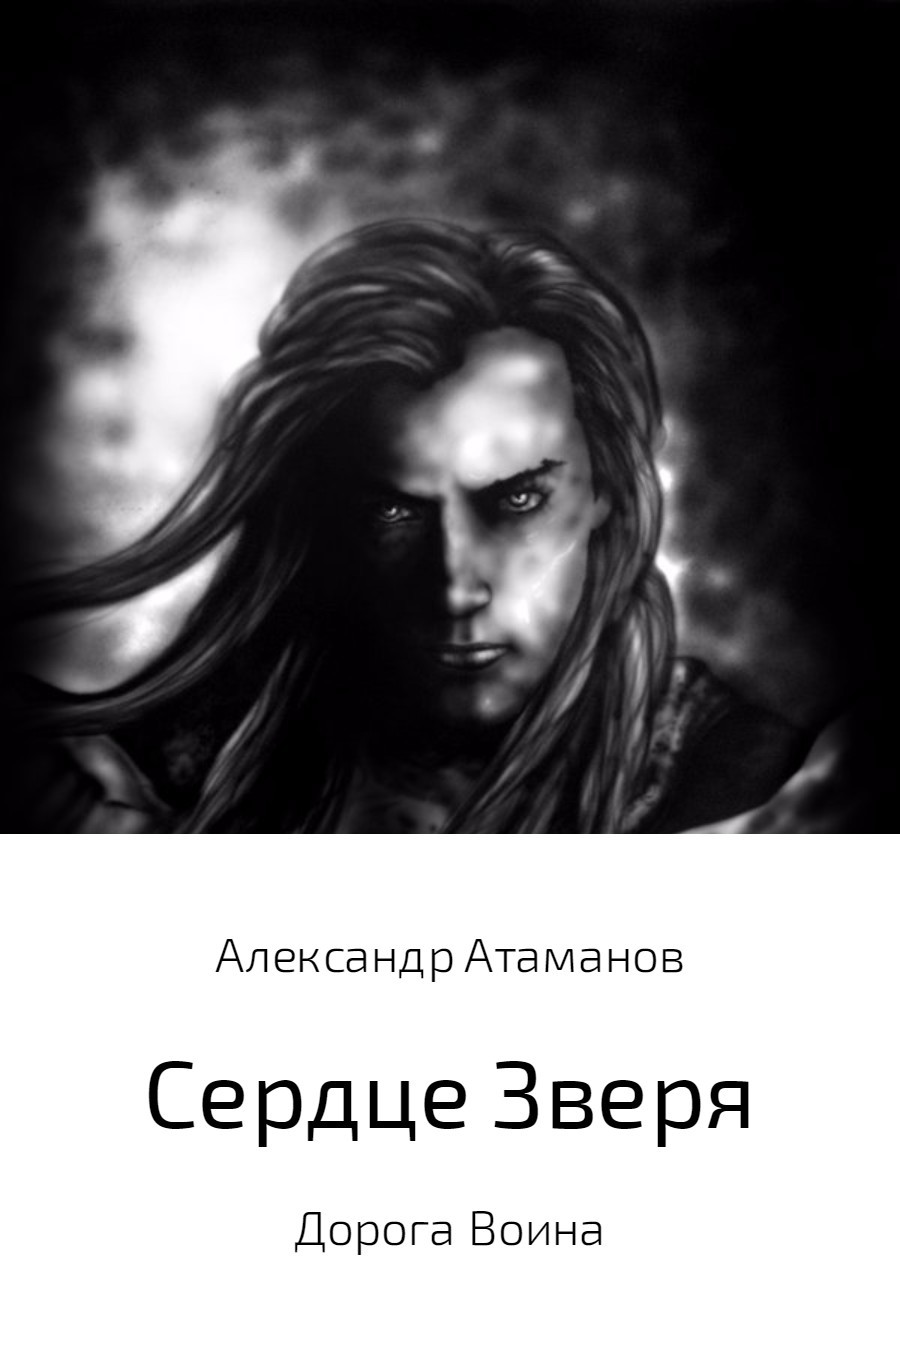 Александр Николаевич Атаманов бесплатно